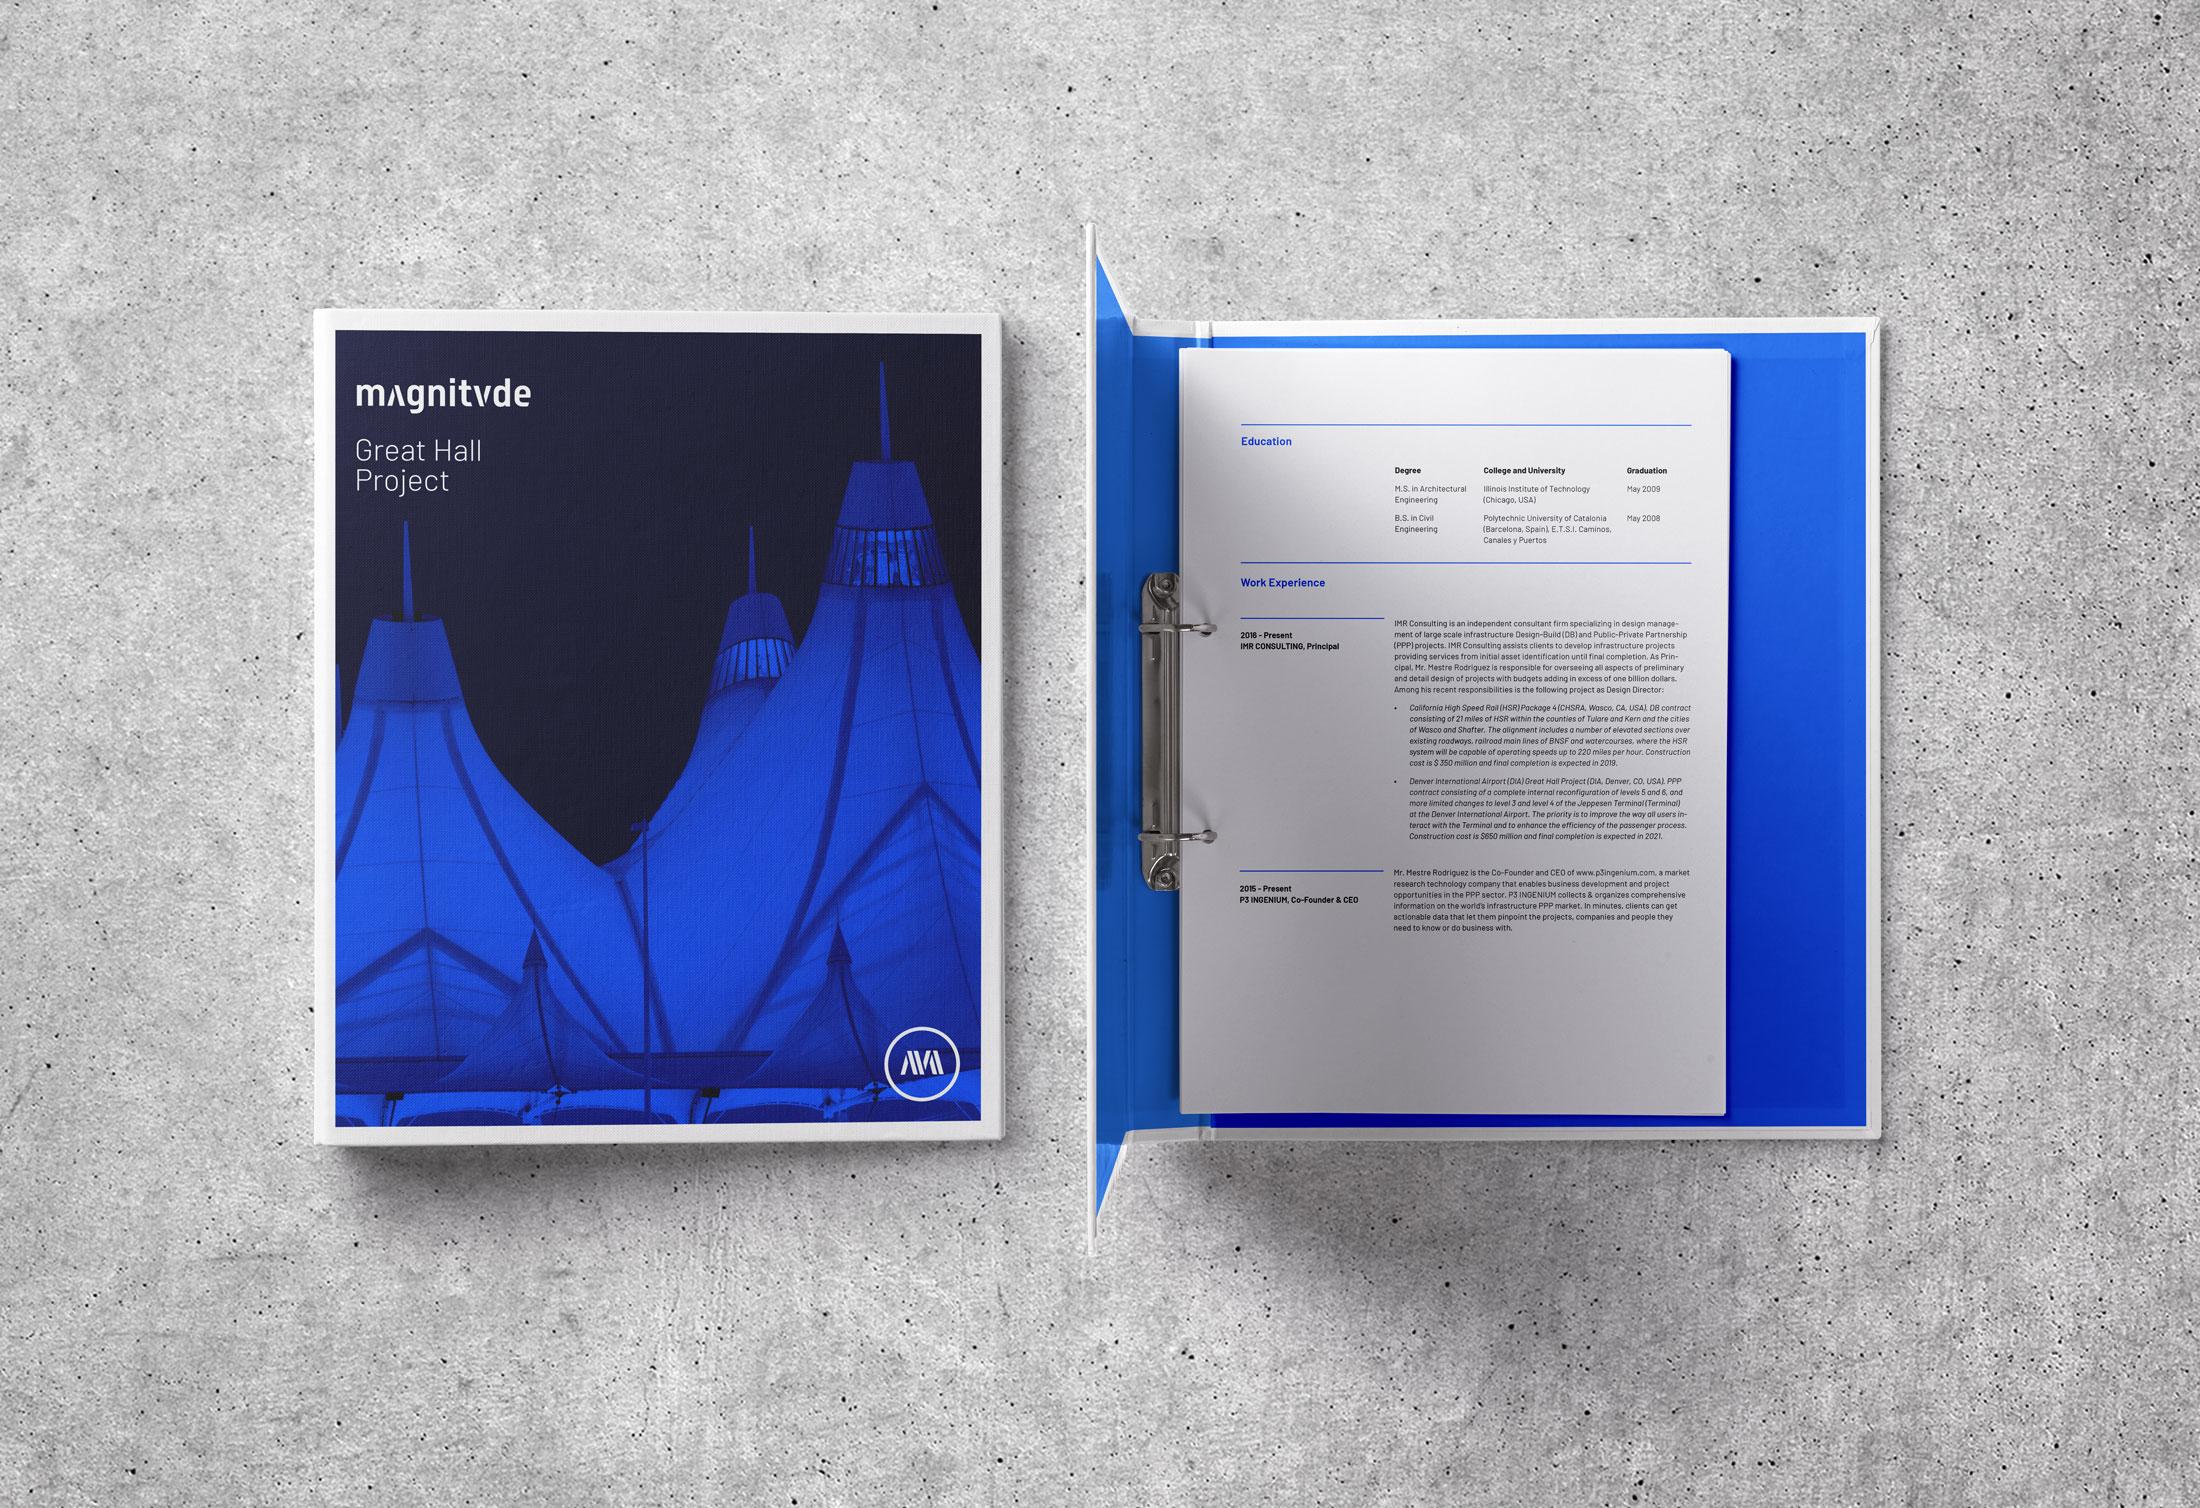 Magnitvde-serraysaez-graphic-design-1.jpg